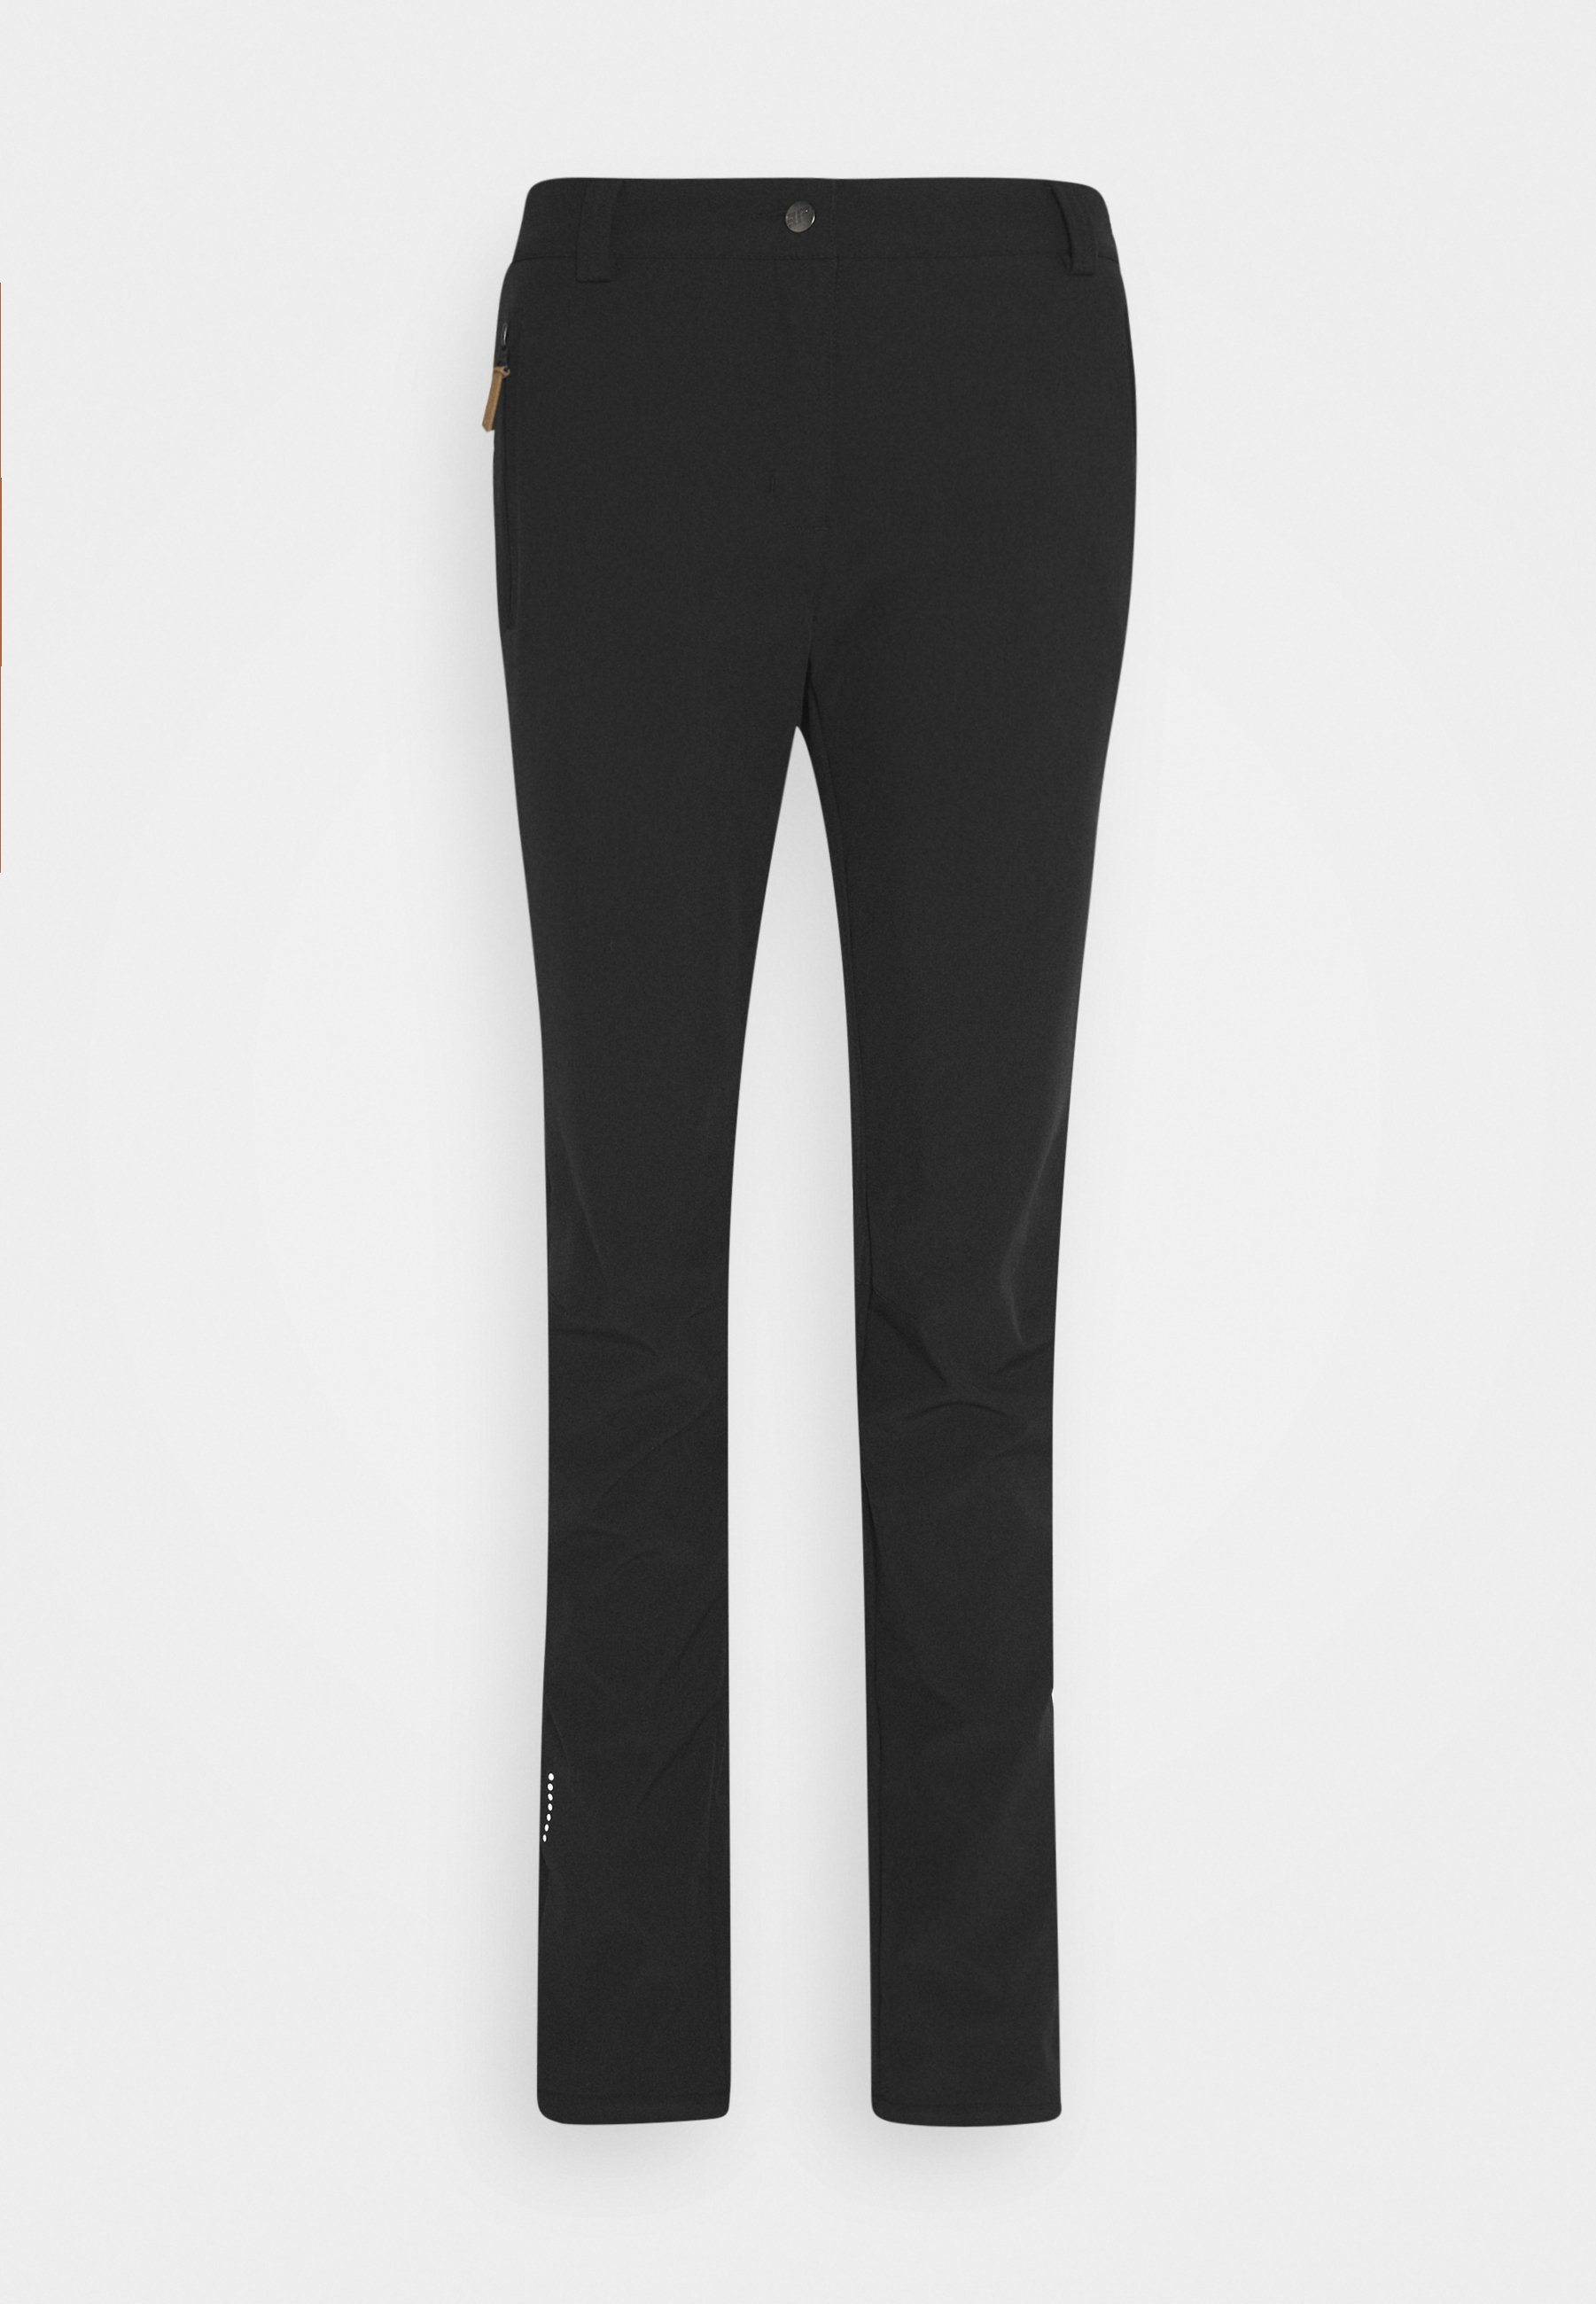 Icepeak Softshell-Pantalon PE Argonia Femmes Noir